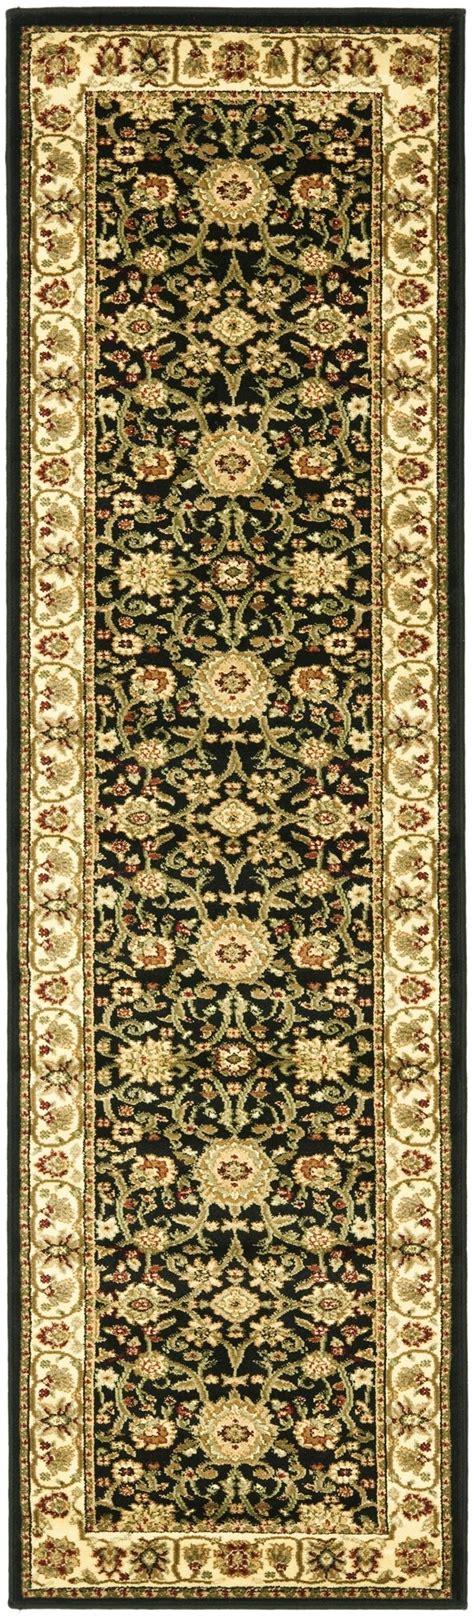 area rugs direct safavieh lyndhurst rug safavieh area rugs safavieh lyndhurst rugs rugs direct